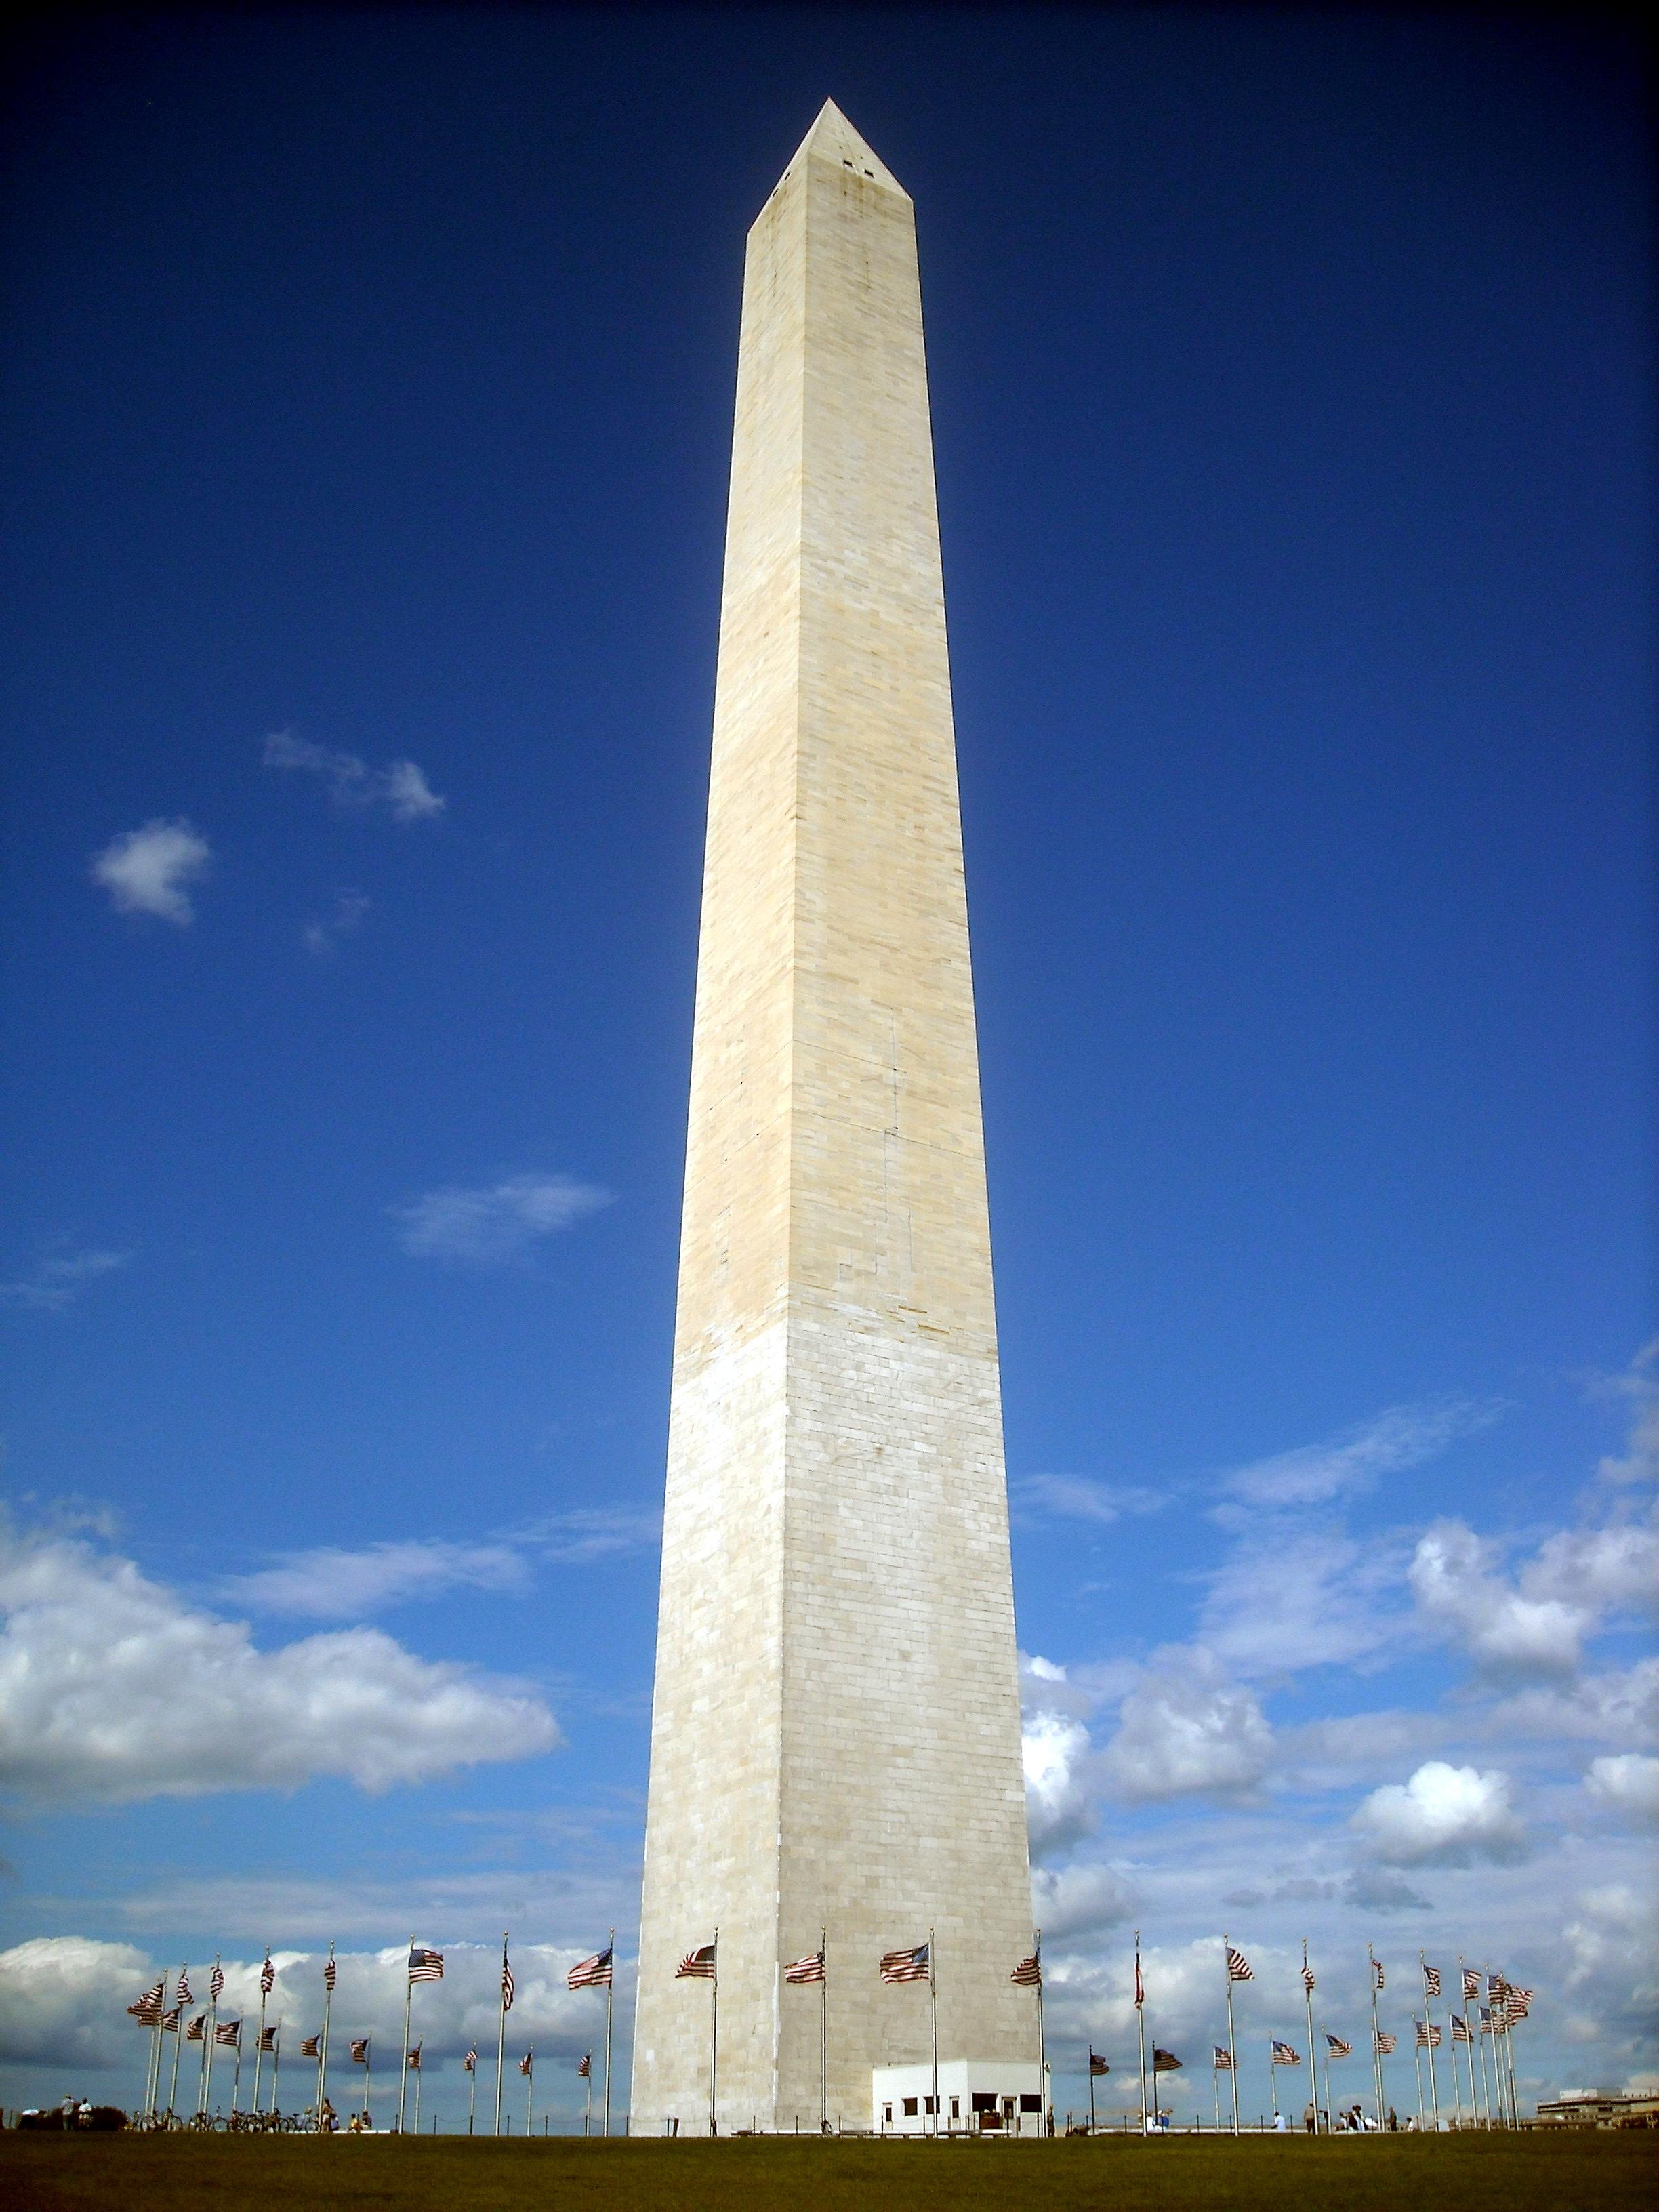 File:Washington Monument - Washington, D.C..jpg - Wikimedia Commons